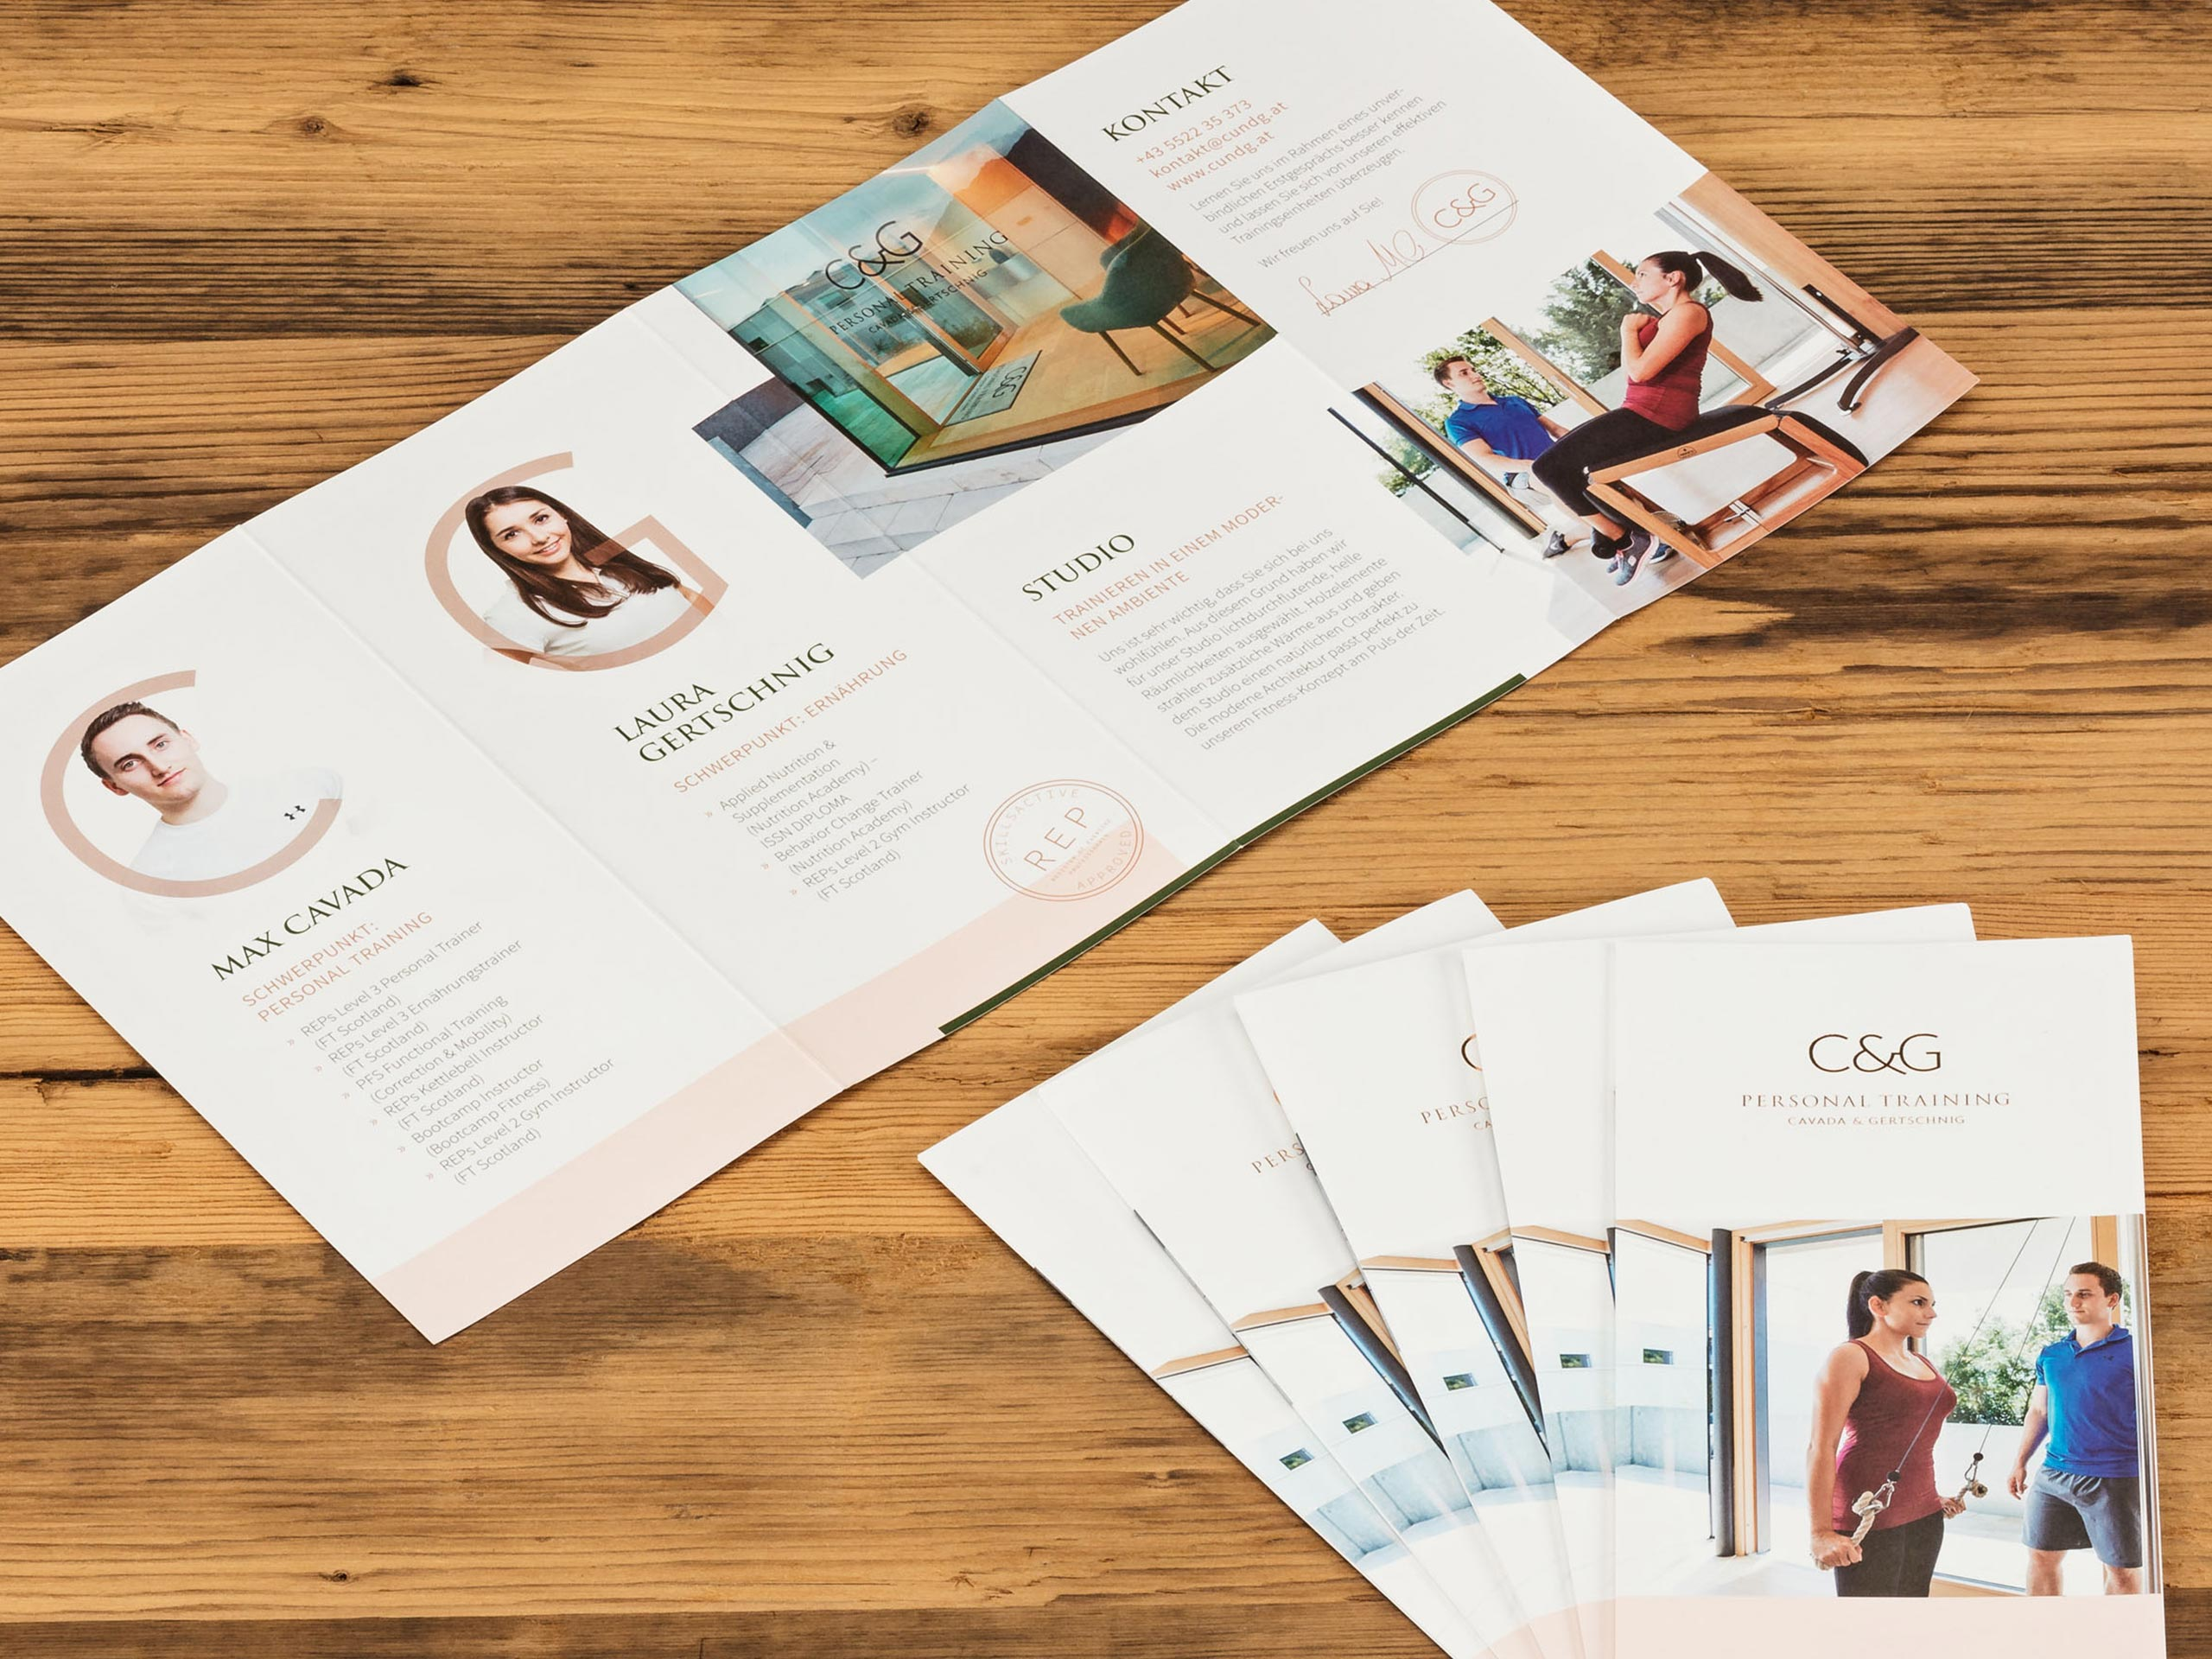 C & G –Broschüre